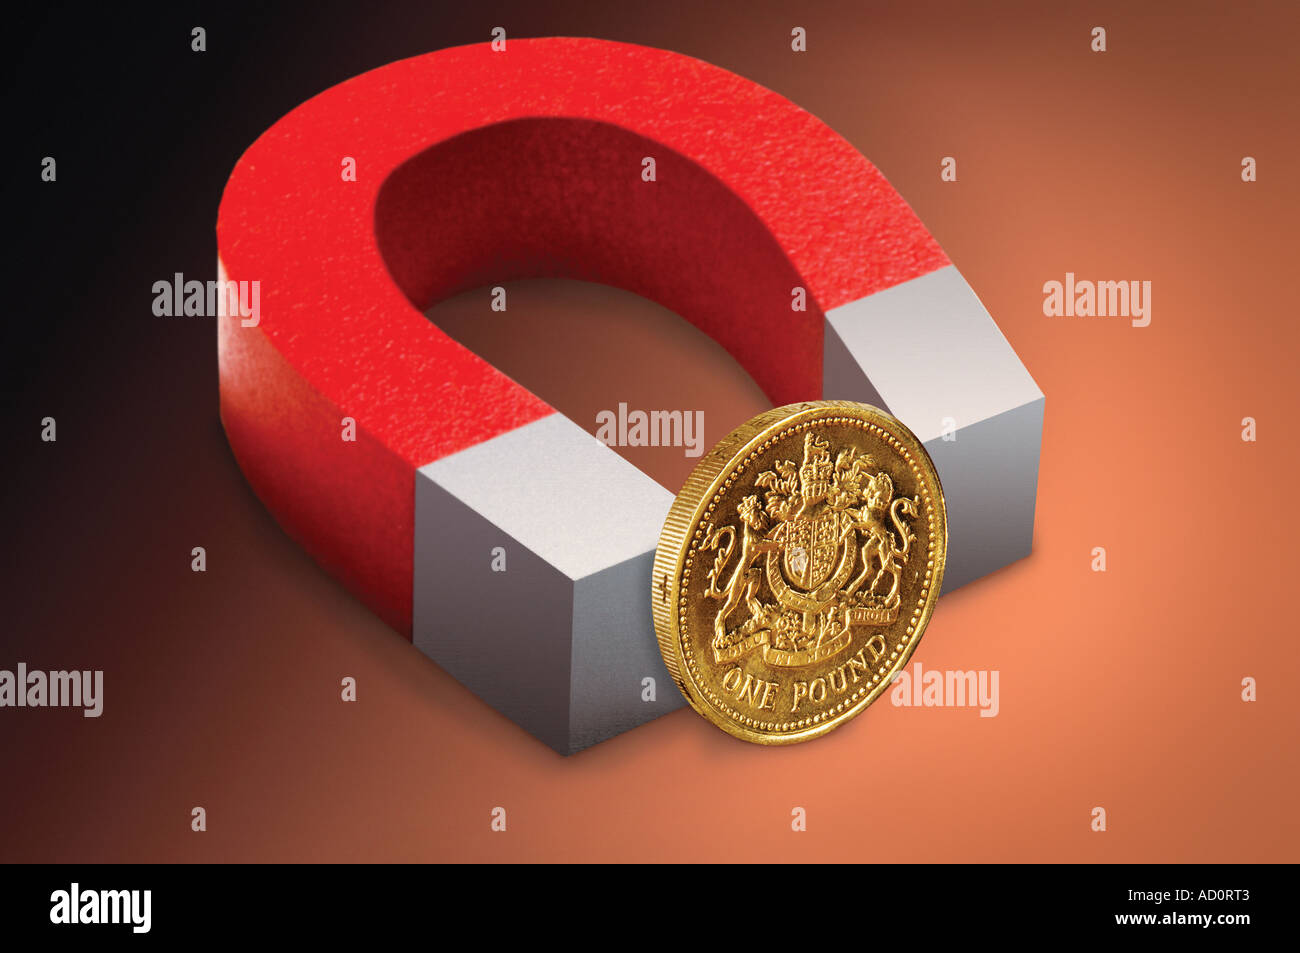 Aimant et Pound coins Photo Stock